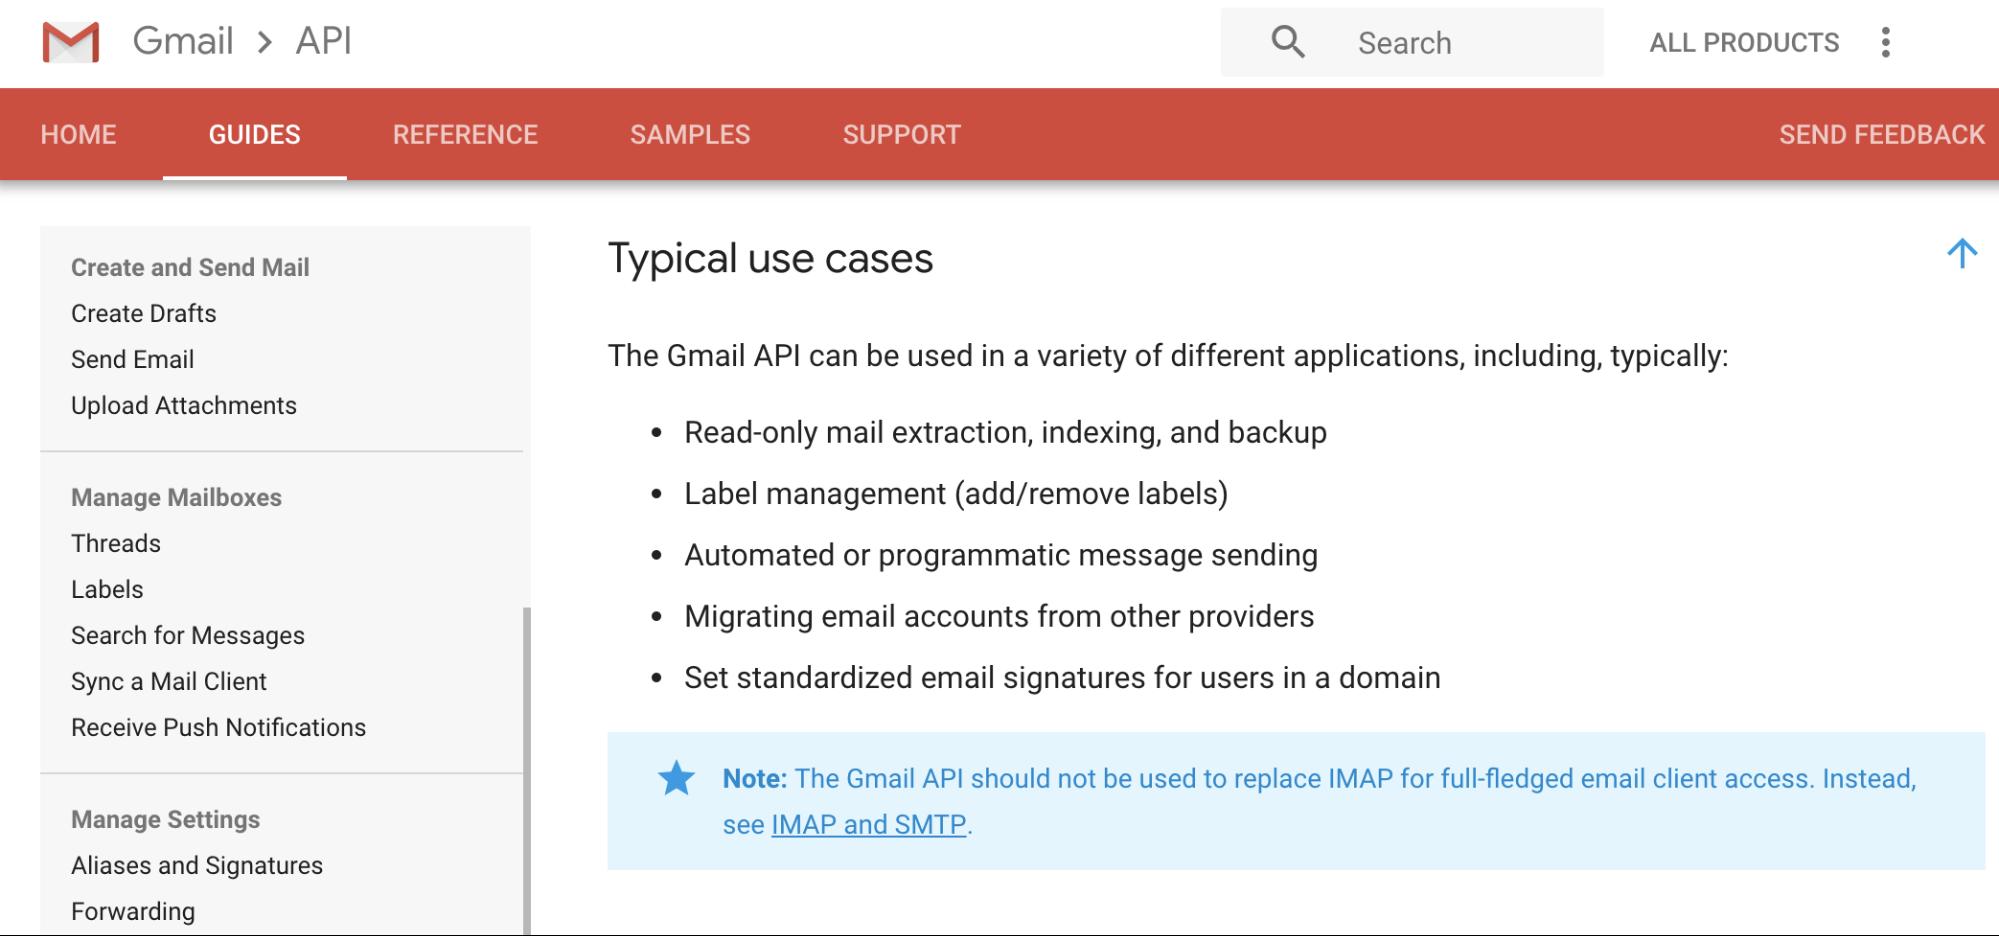 GMail API use cases